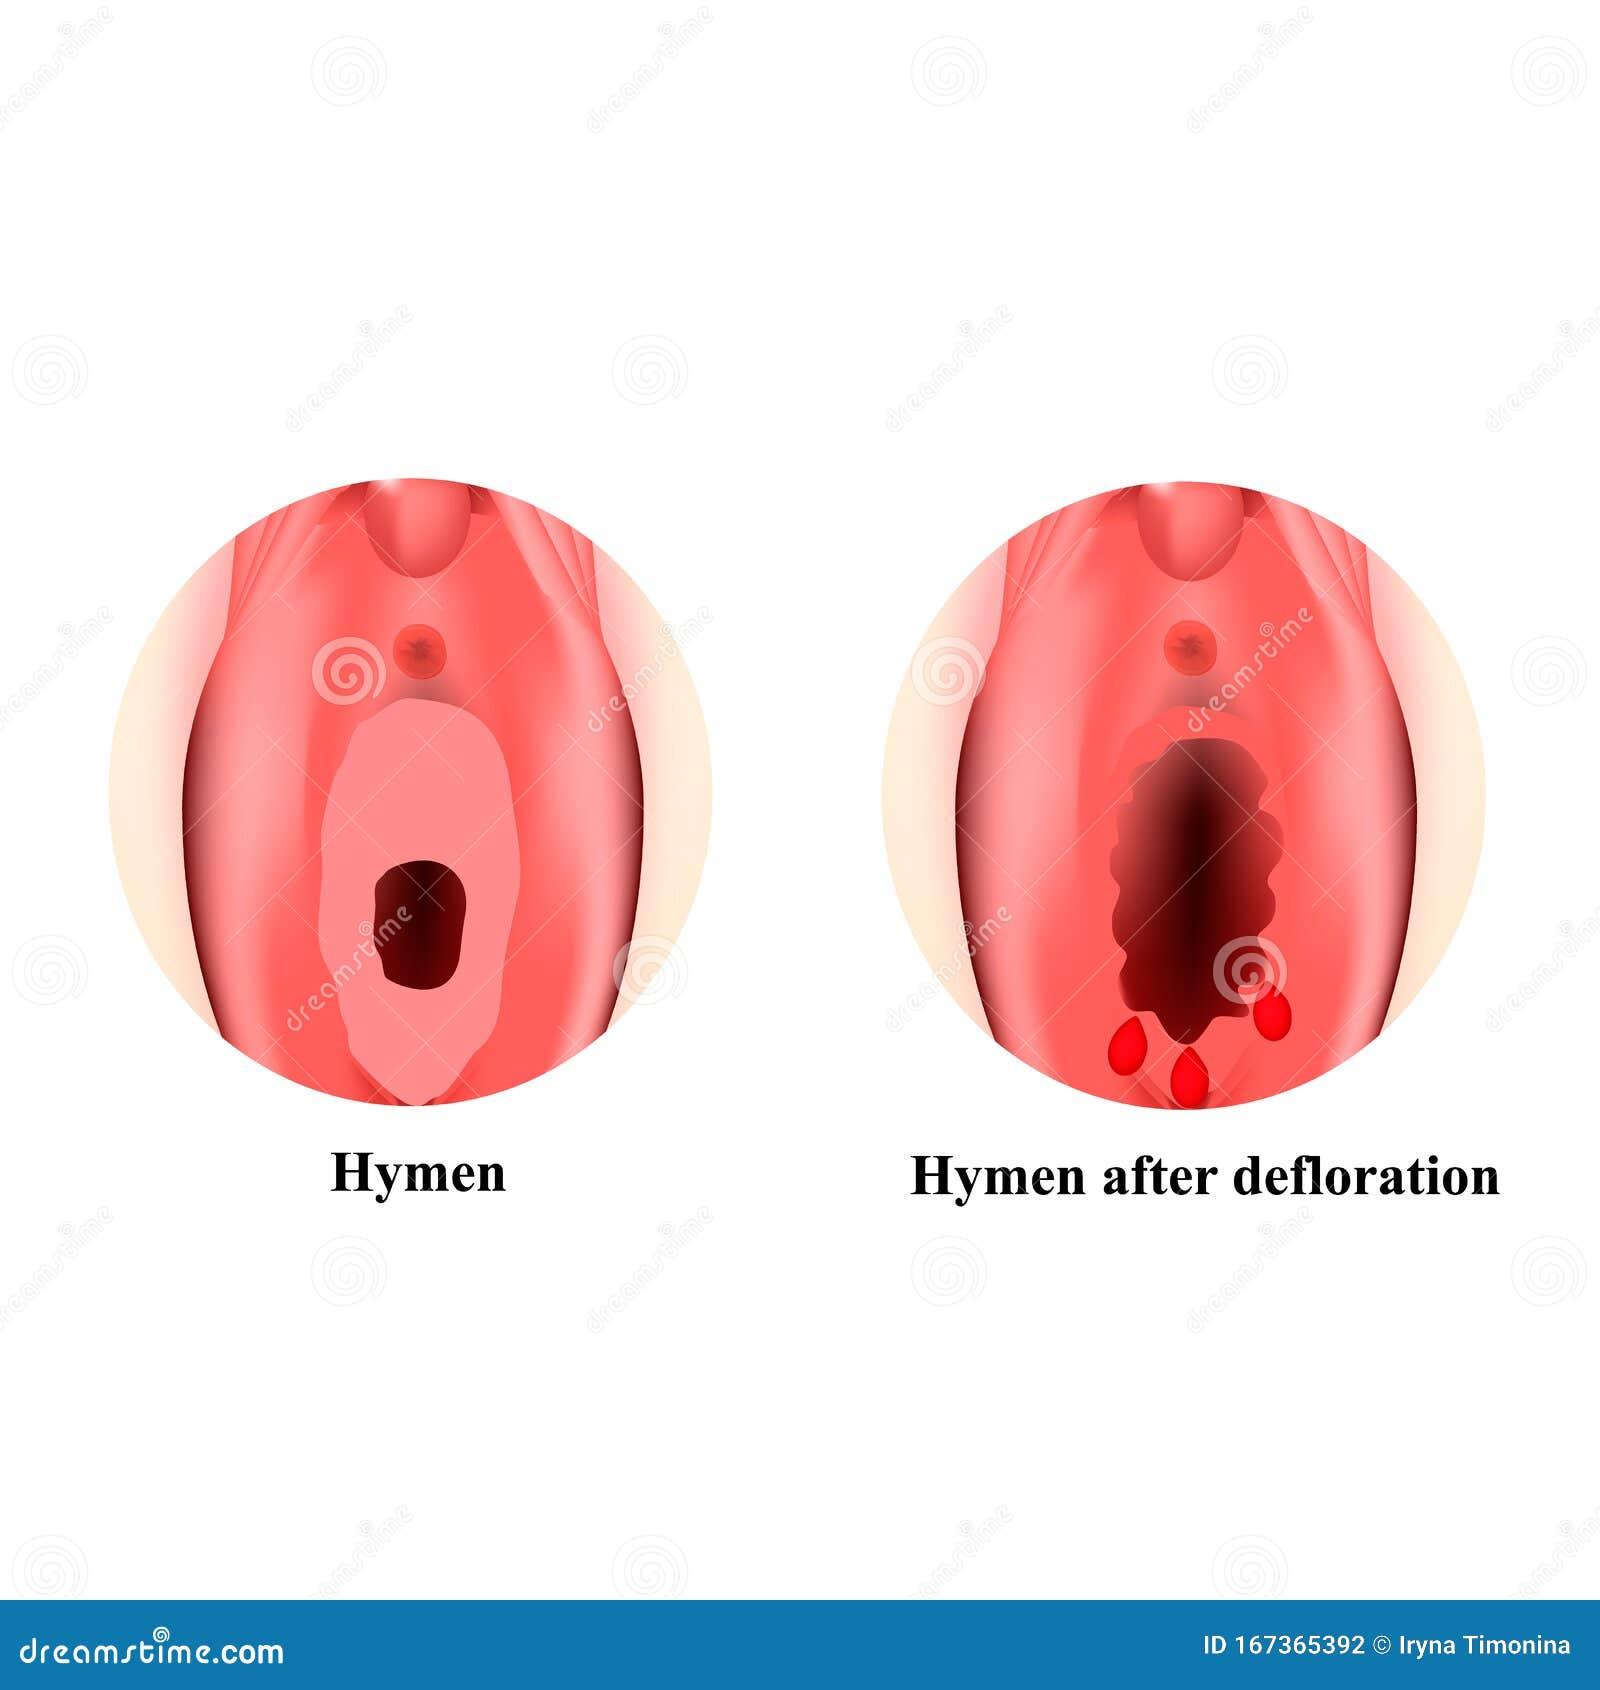 Hymen defloration video